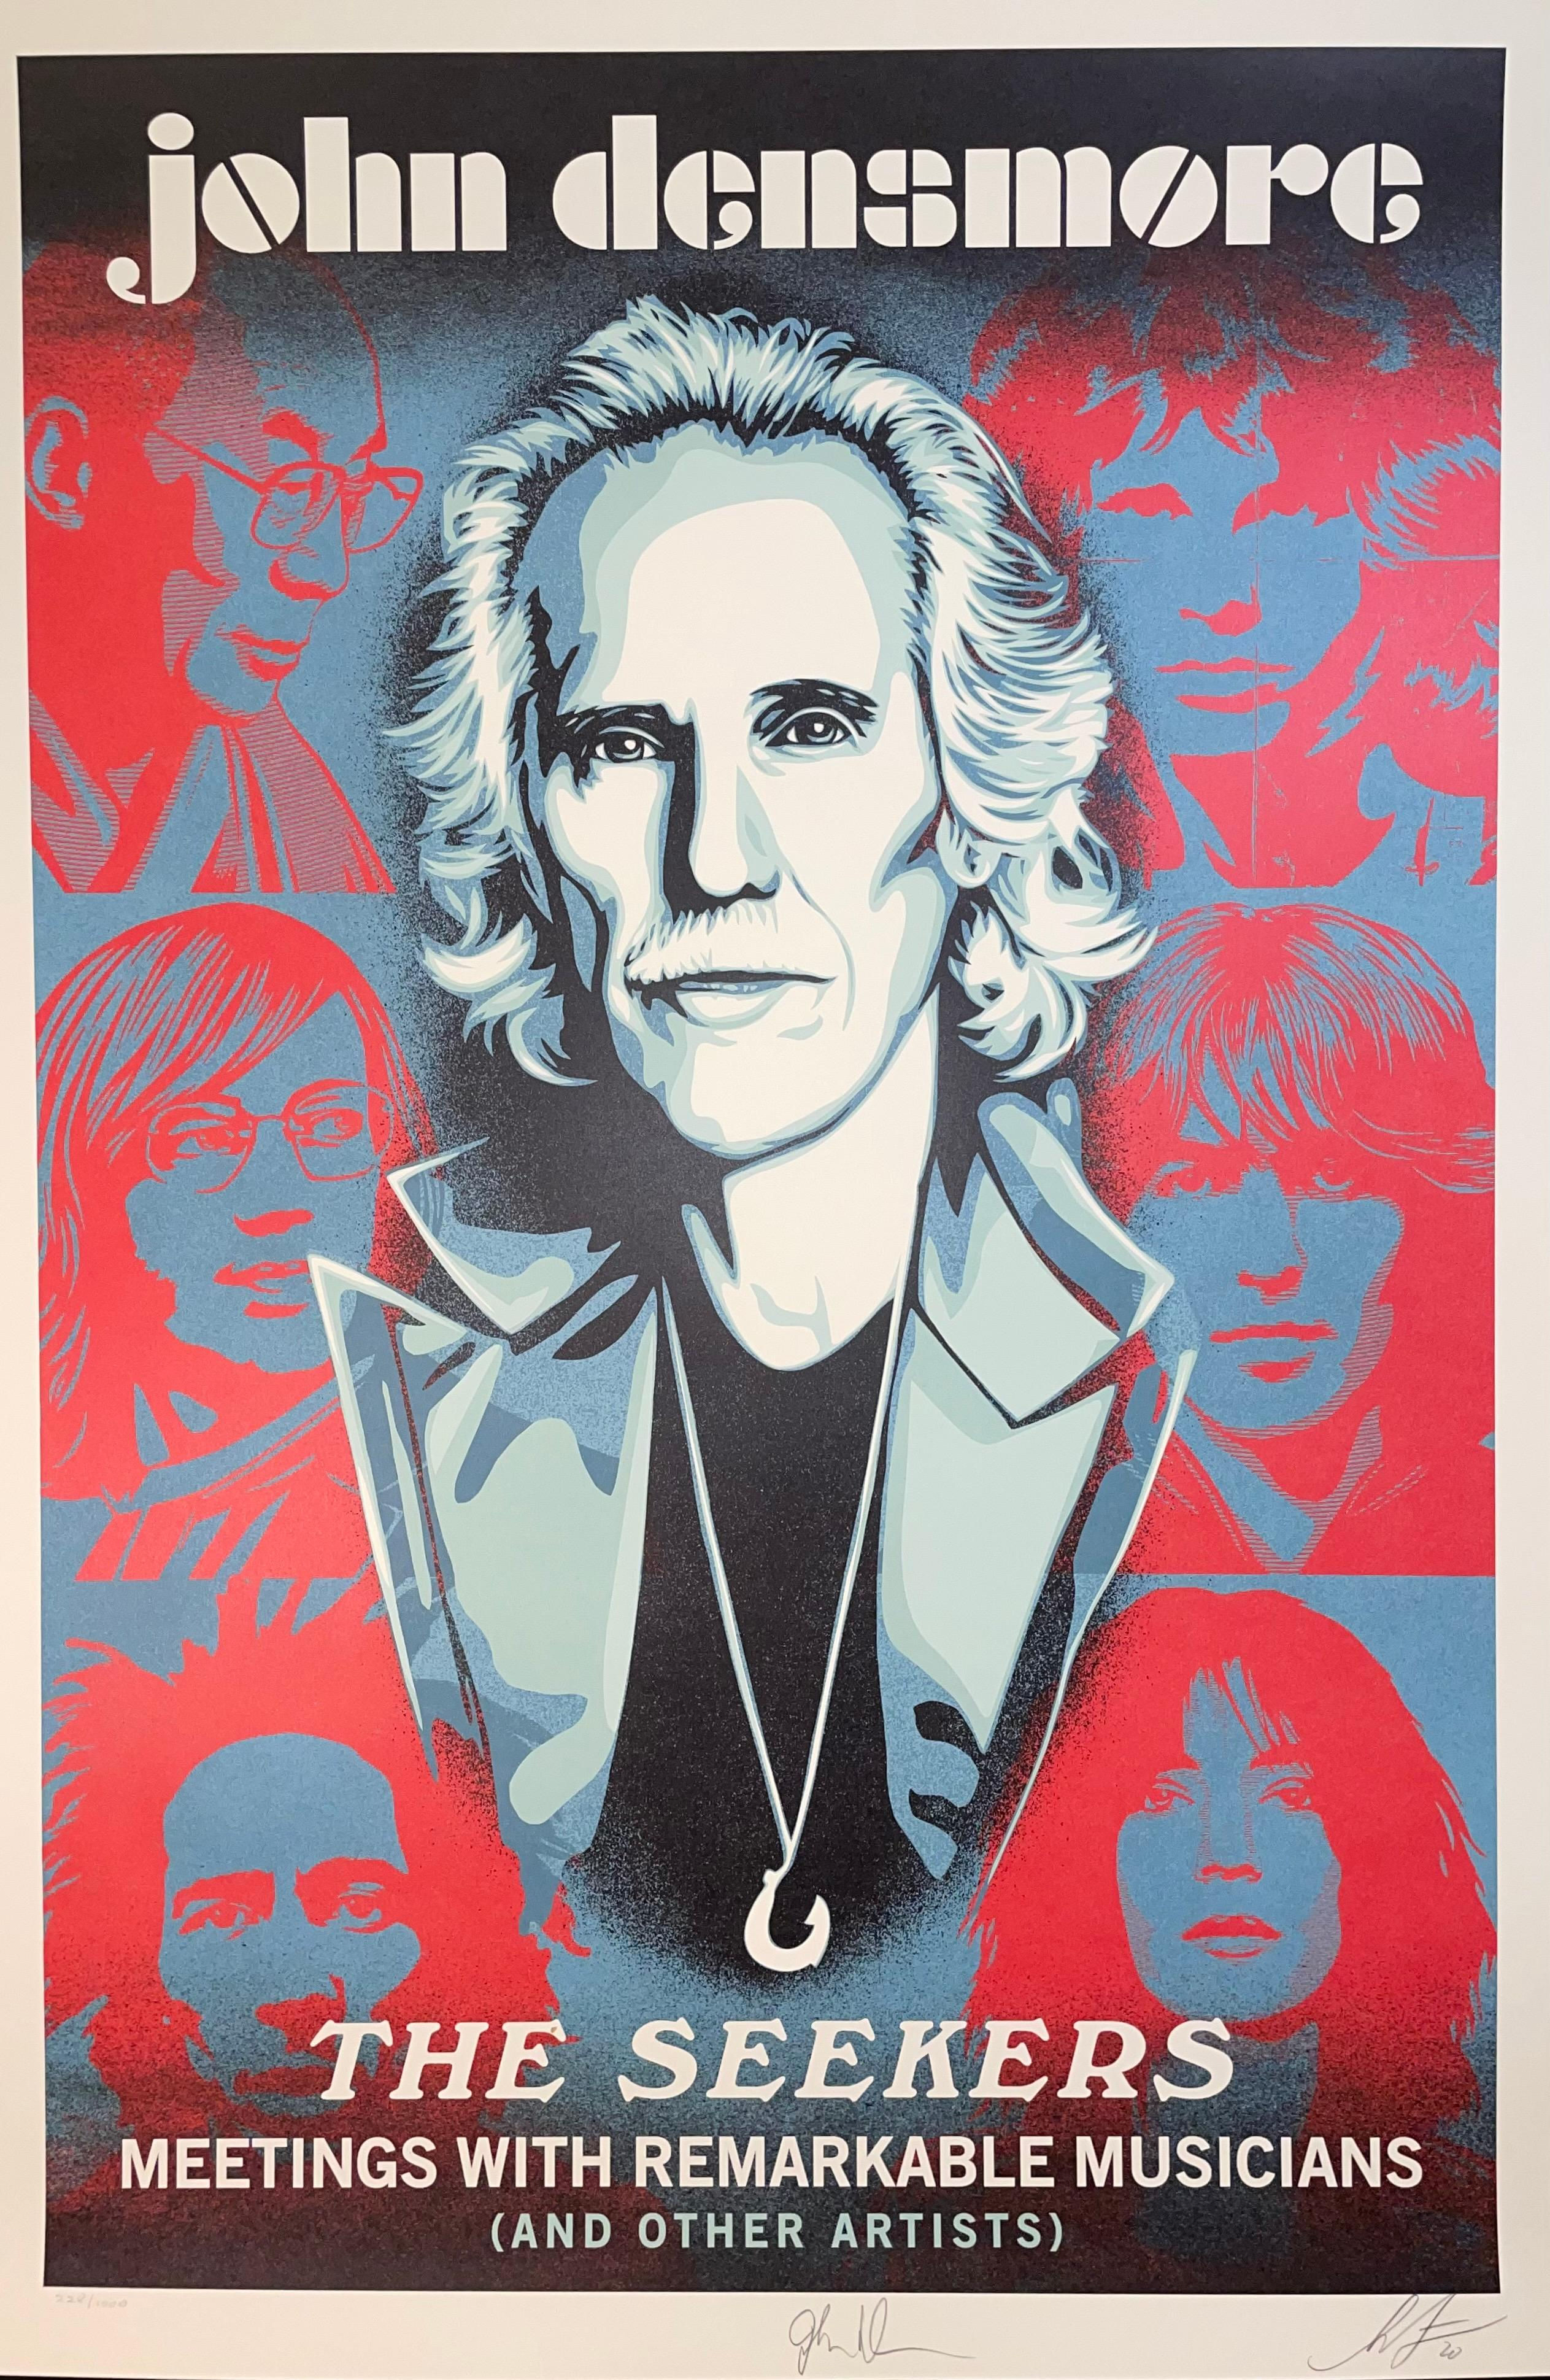 Shepard Fairey Obey Giant John Densmore: The Seekers The Doors Street Art Music